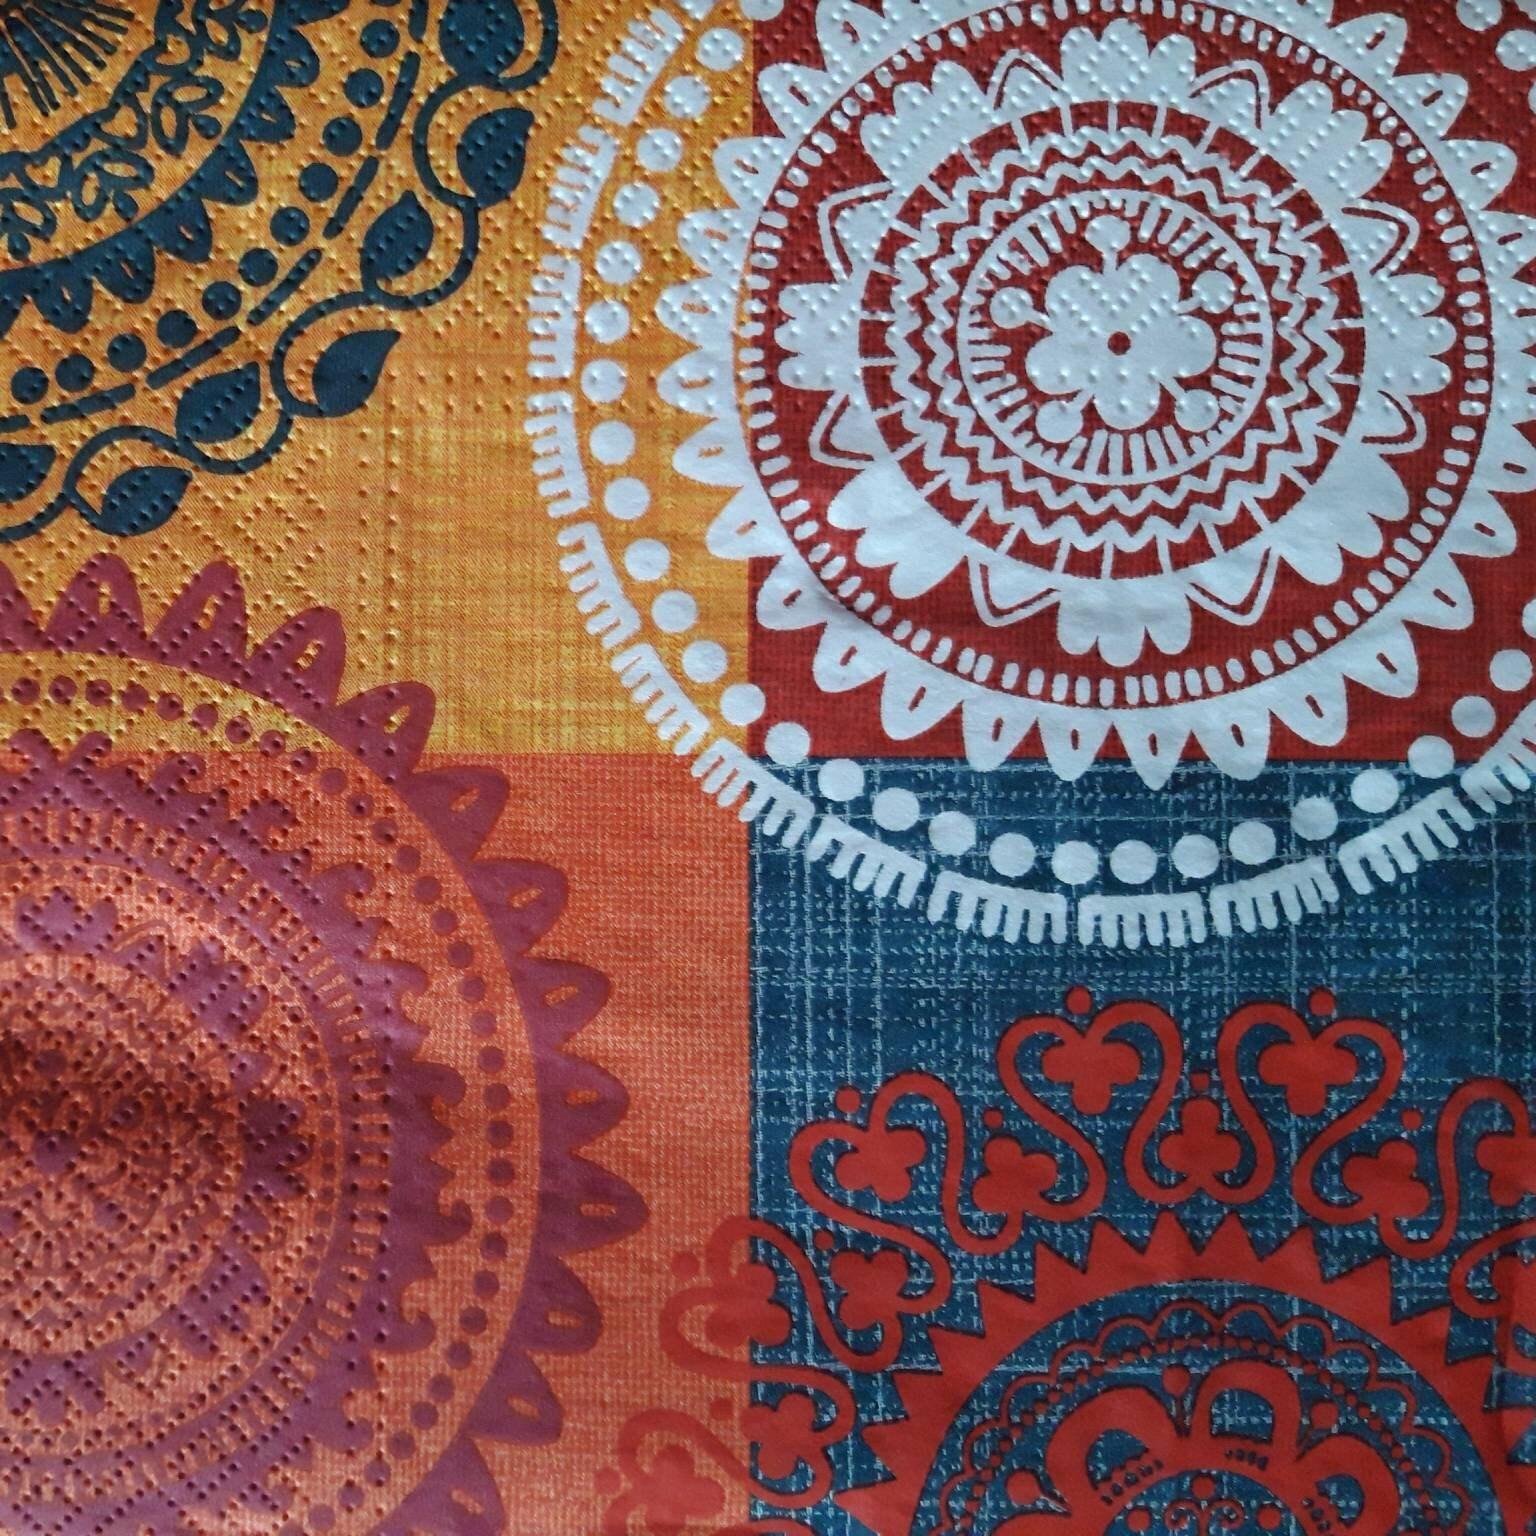 4 Printed Paper Napkins Patterned Napkins Decoupage Napkin